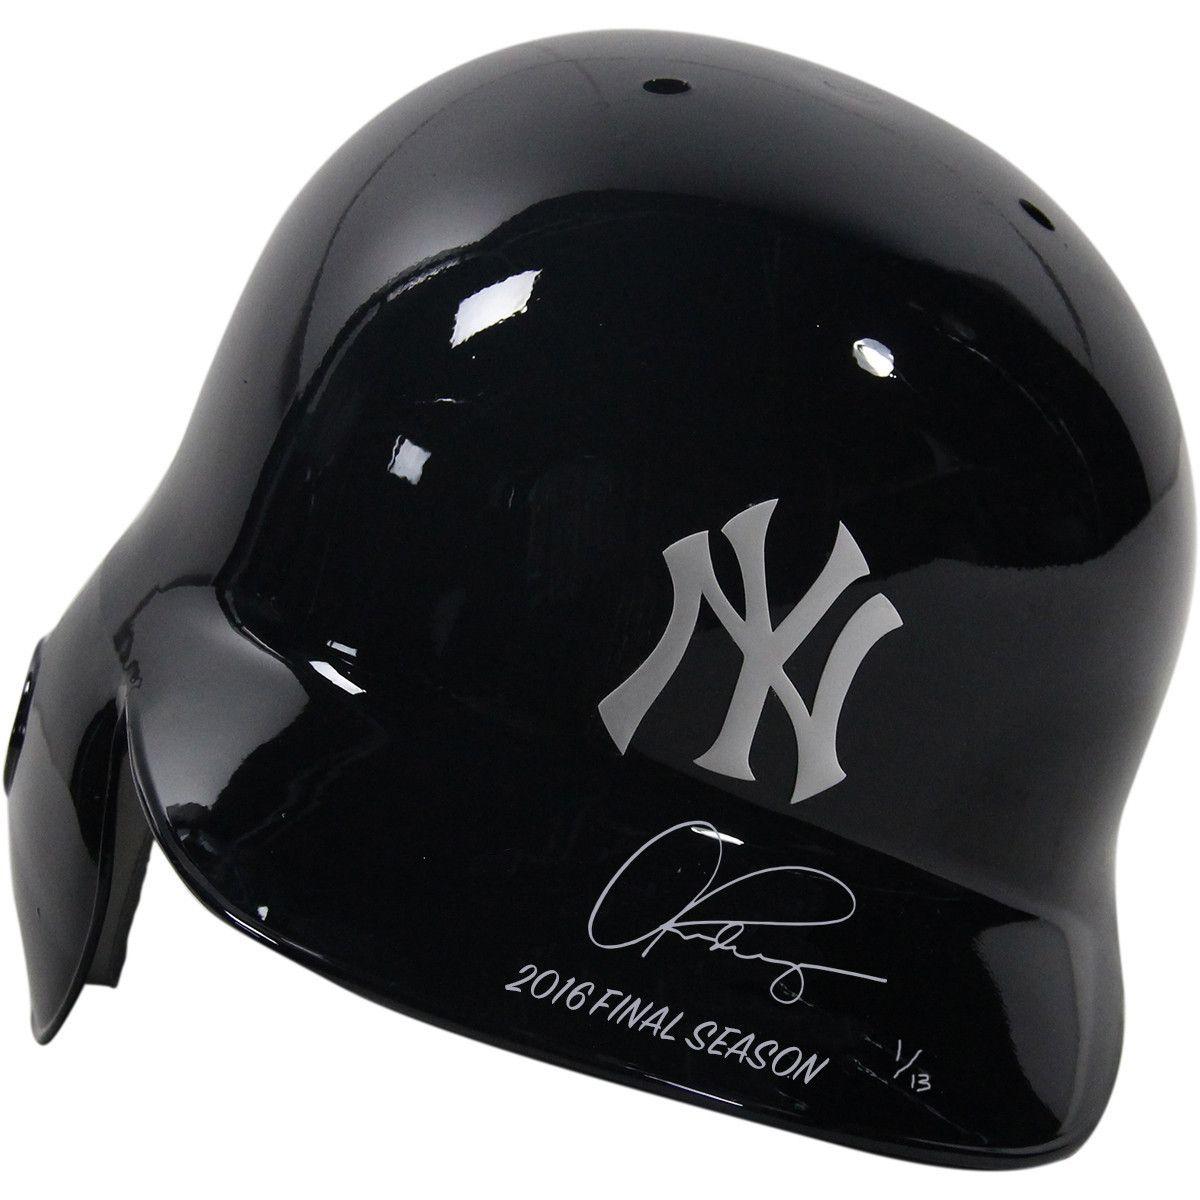 Alex Rodriguez Signed New York Yankees Batting Helmet With 2016 Final Season Batting Helmet Helmet New York Yankees